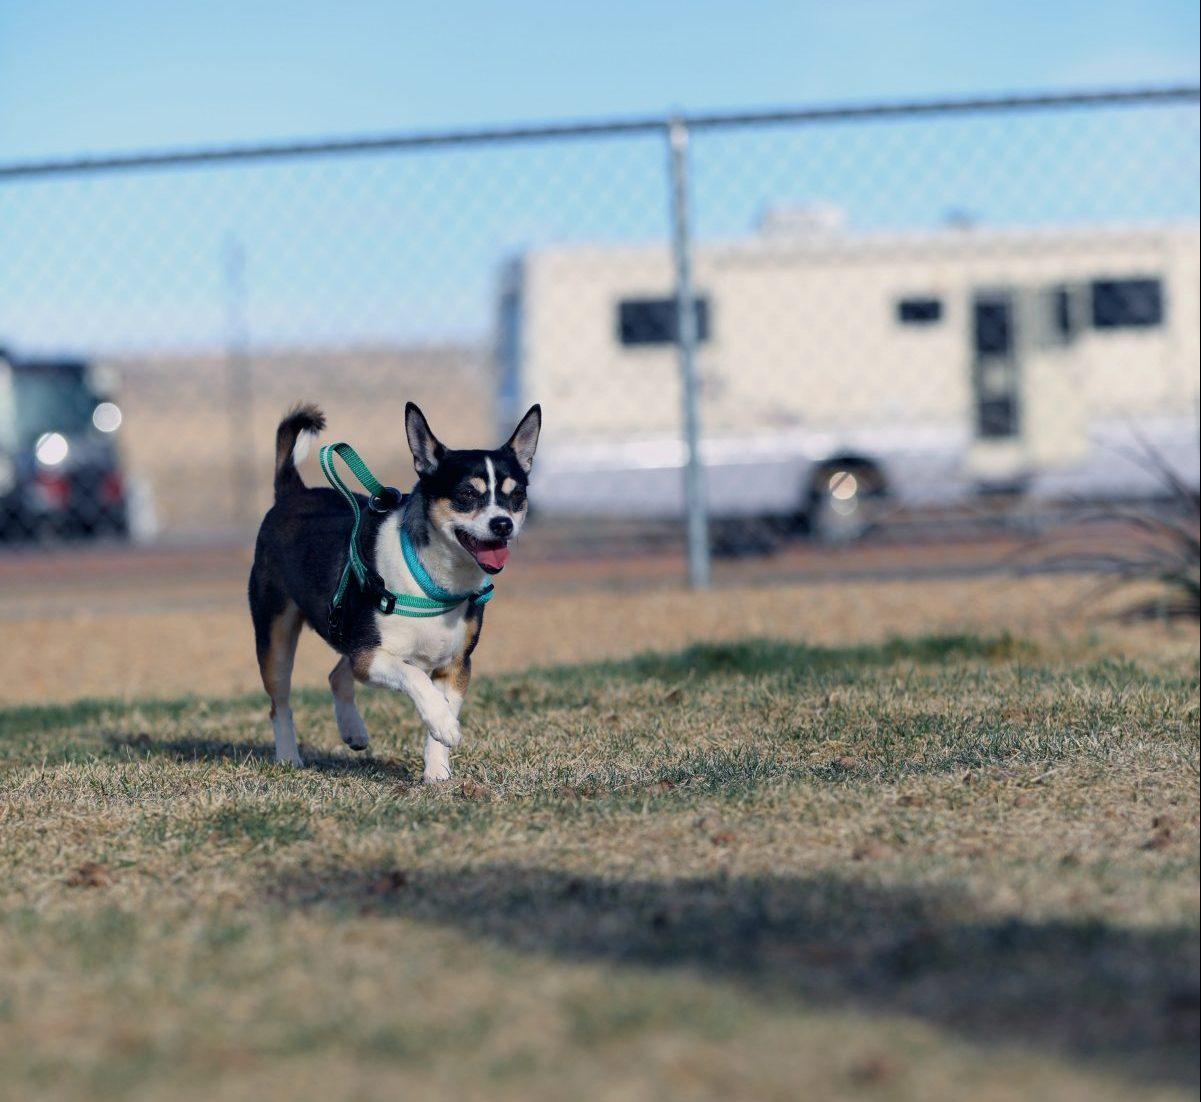 Route 66 RV Resort - dog park